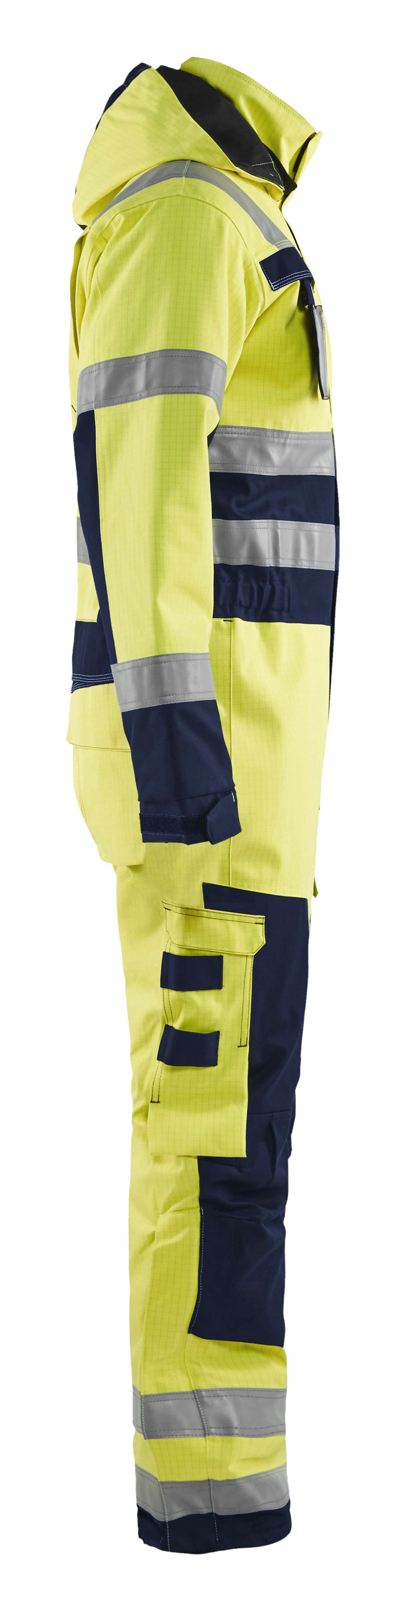 Blaklader Overalls 63681530 Multinorm geel-marineblauw(3389)